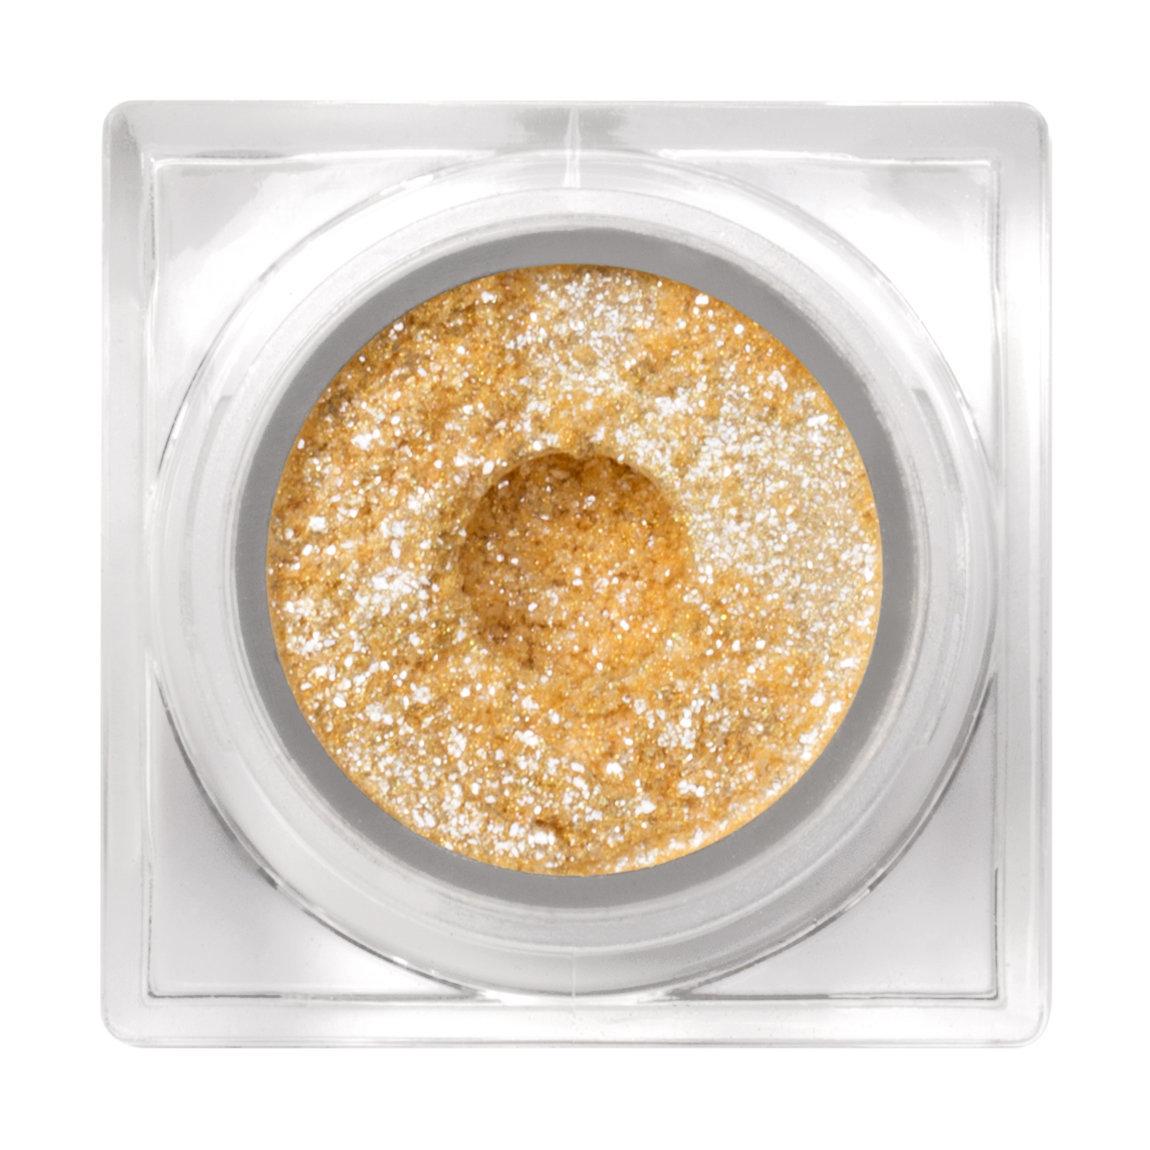 Lit Cosmetics Lit Metals Glisten (Silver) alternative view 1 - product swatch.